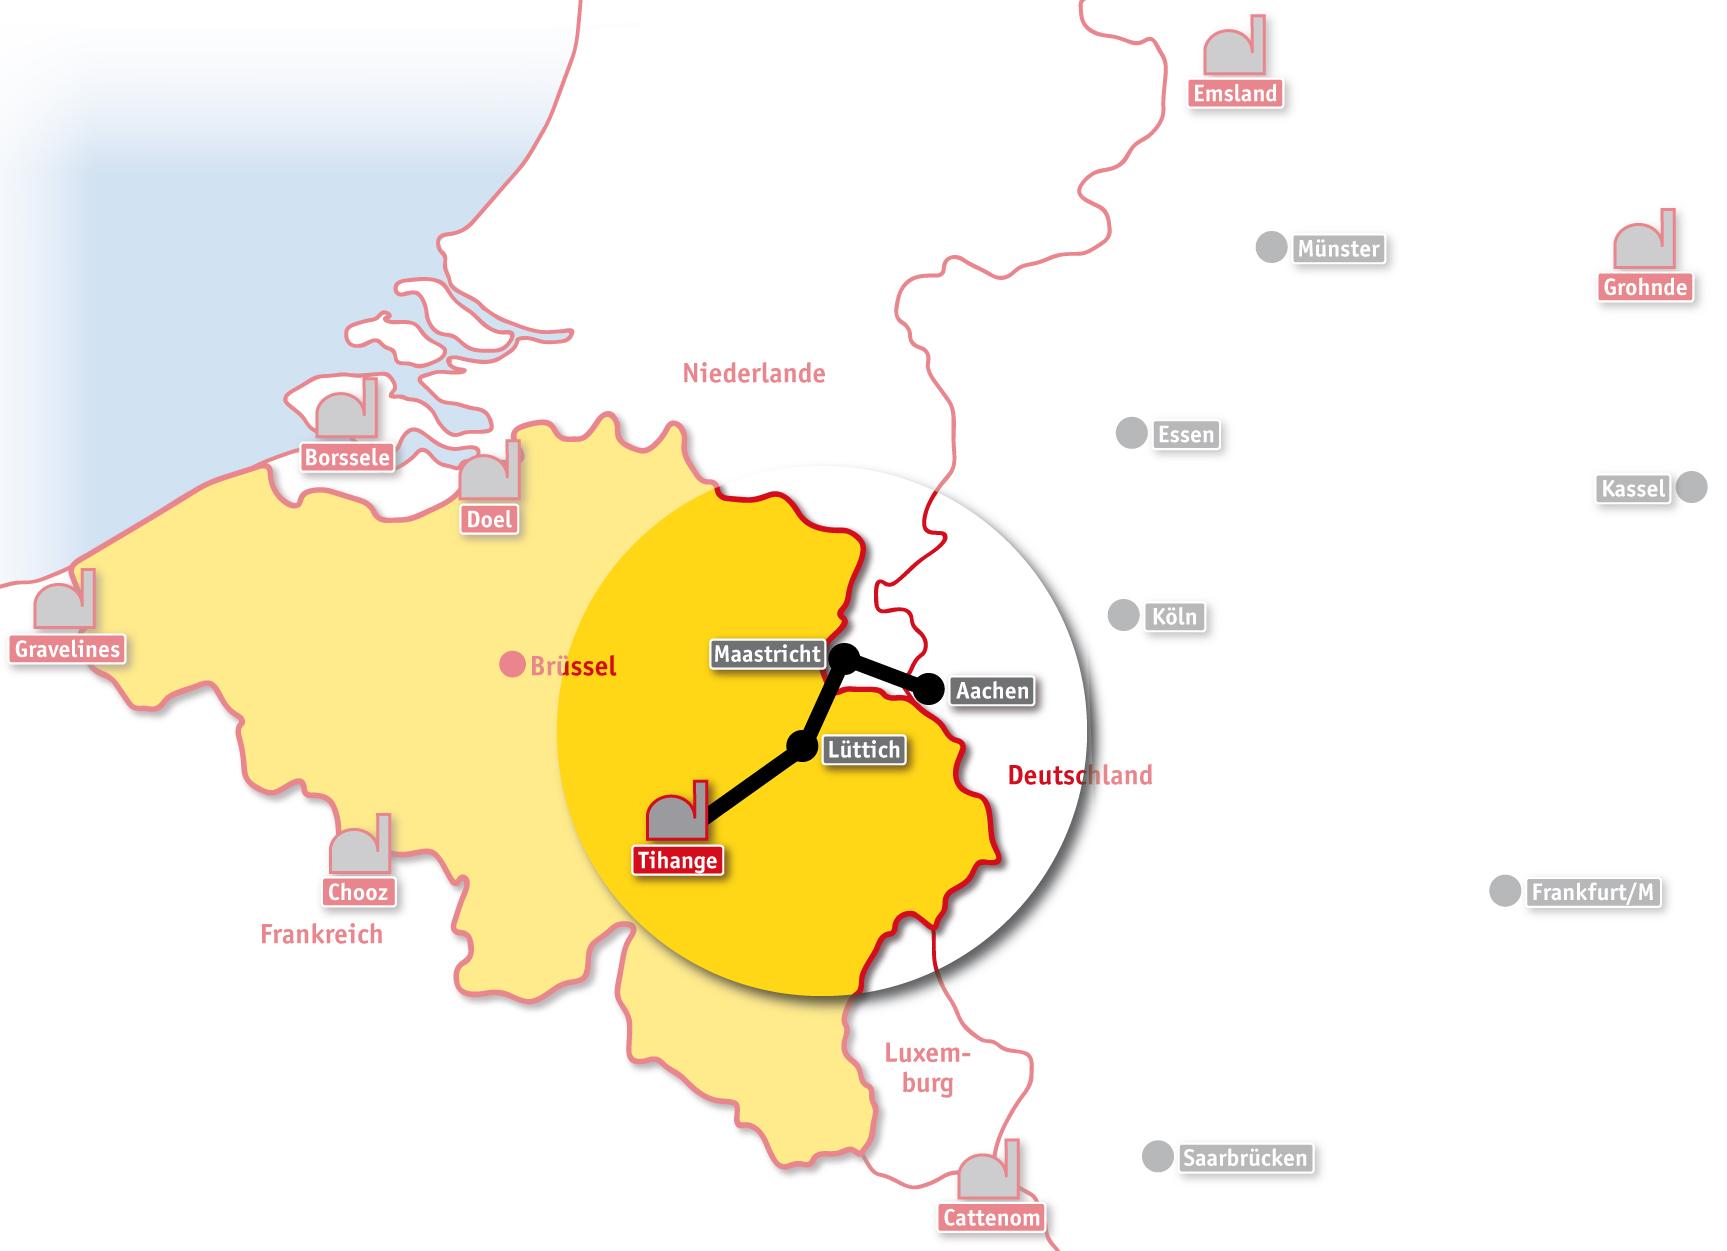 Aachen Karte Stadtteile.Tihange Menschenkette Ausgestrahlt De